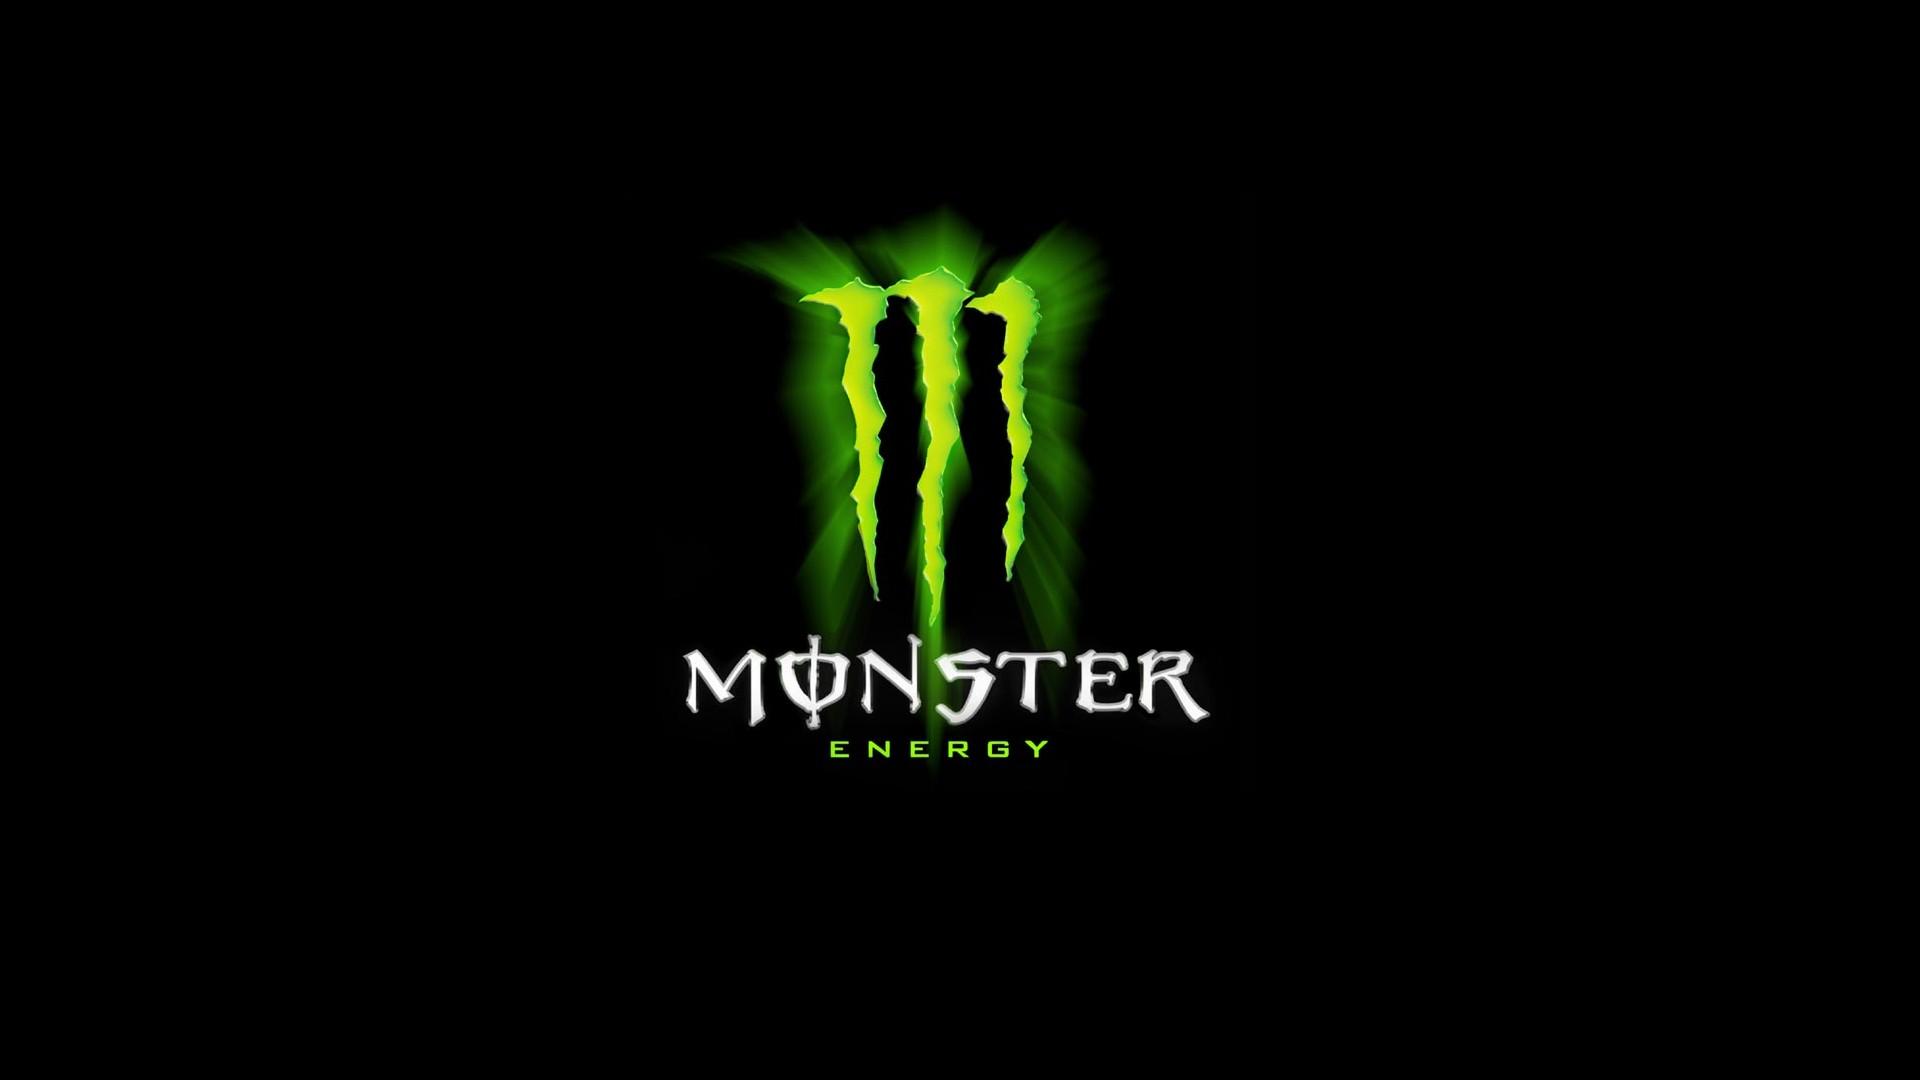 Monster wallpaper download free stunning full hd backgrounds for desktop mobile laptop in - Monster energy wallpaper download ...